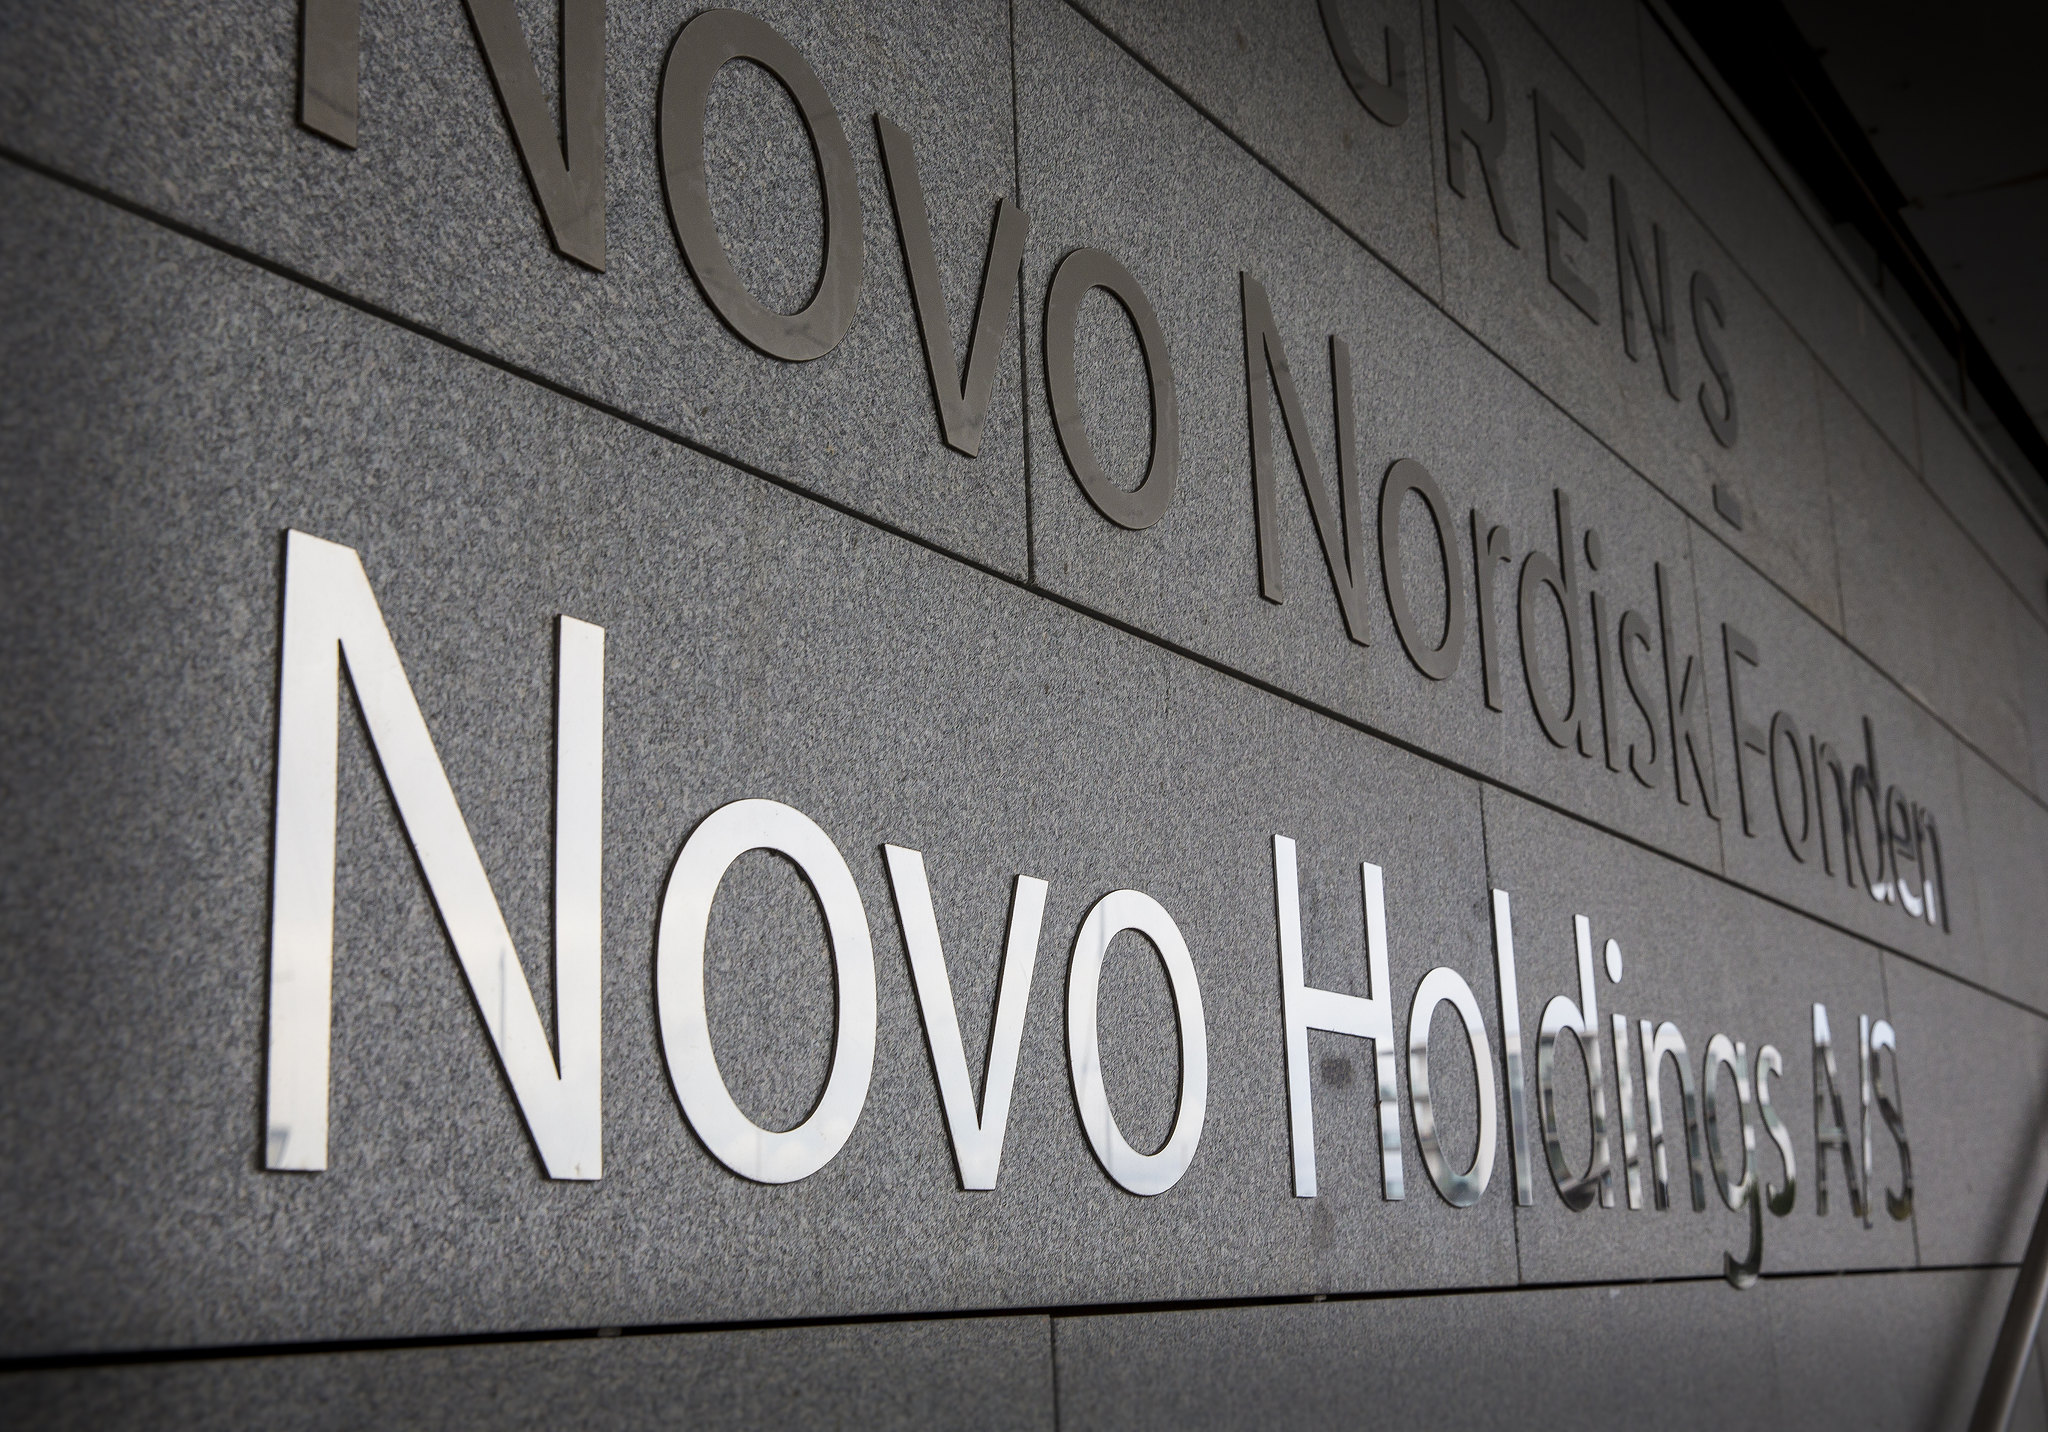 News Novo Nordisk